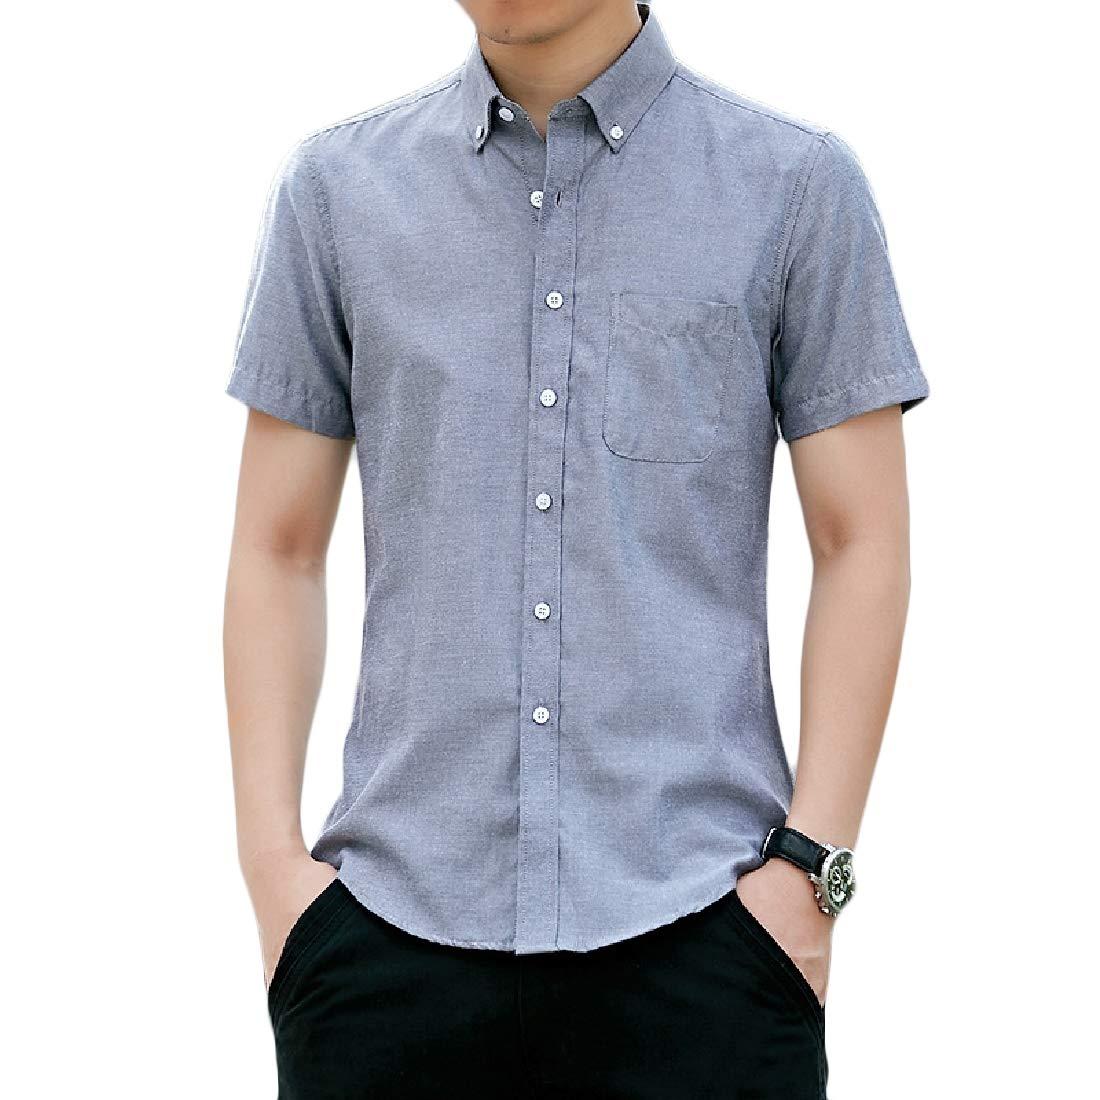 Joe Wenko Mens Casual Button-Down Cotton Short Sleeve Pocket Shirt